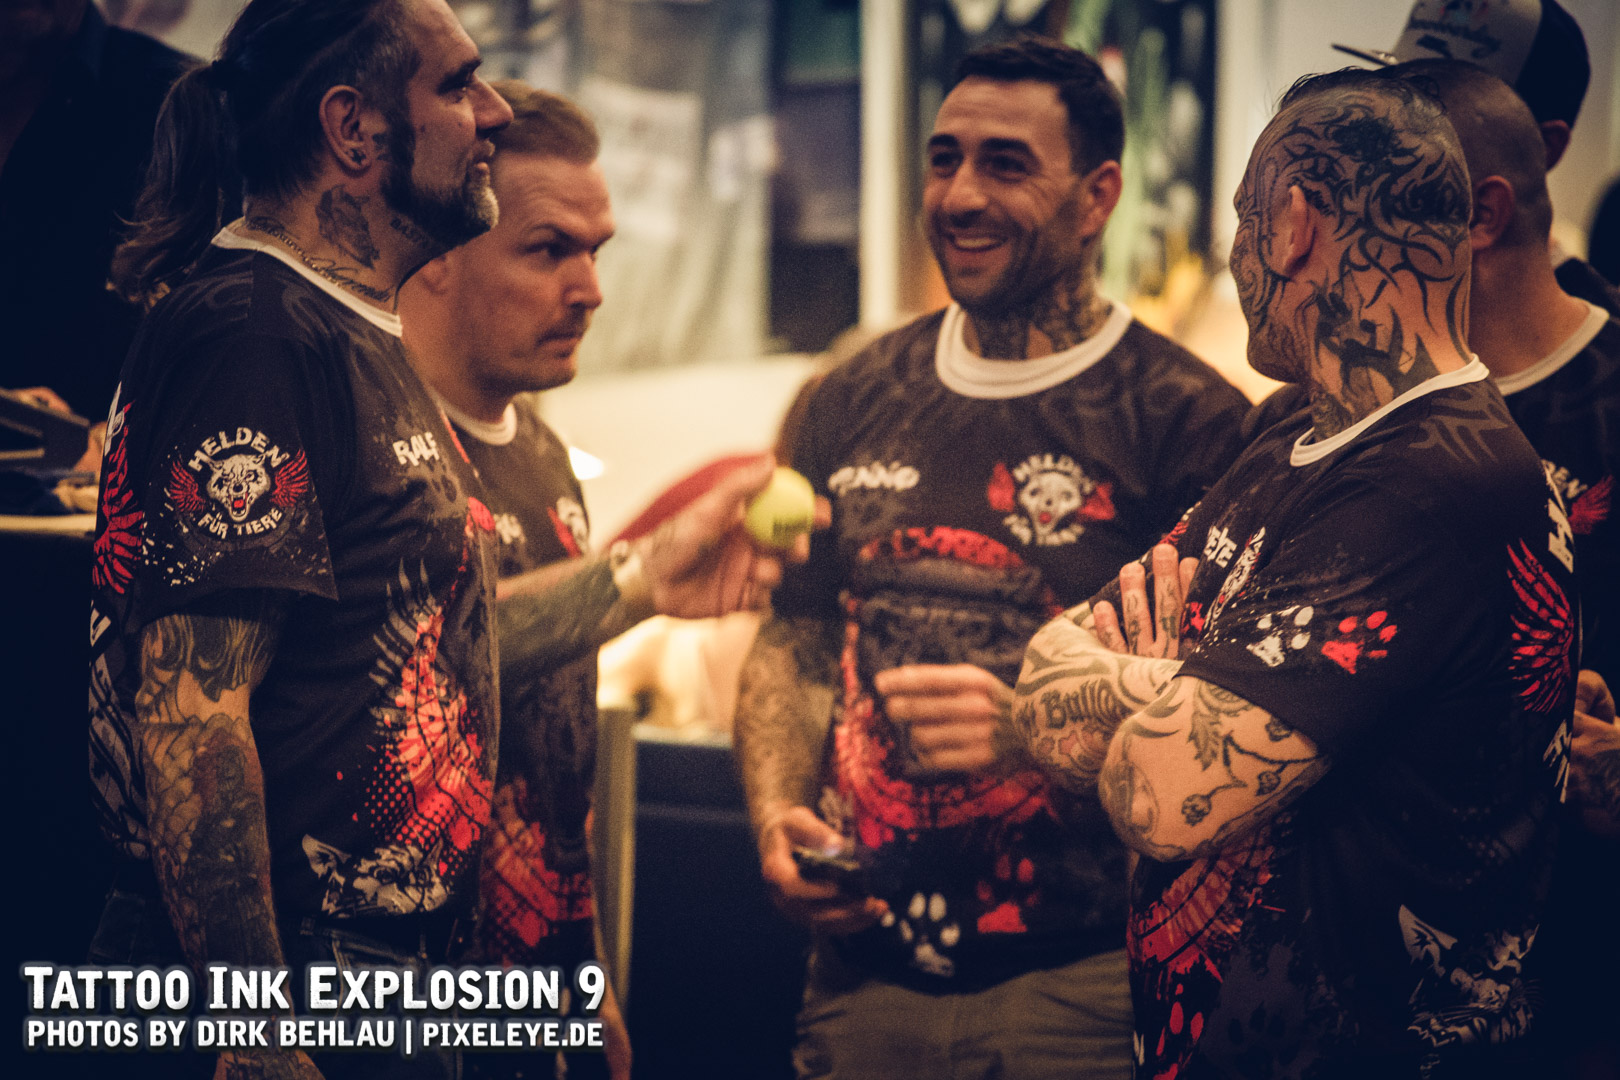 Tattoo Ink Explosion 2018 WEB by Dirk Behlau-1381.jpg